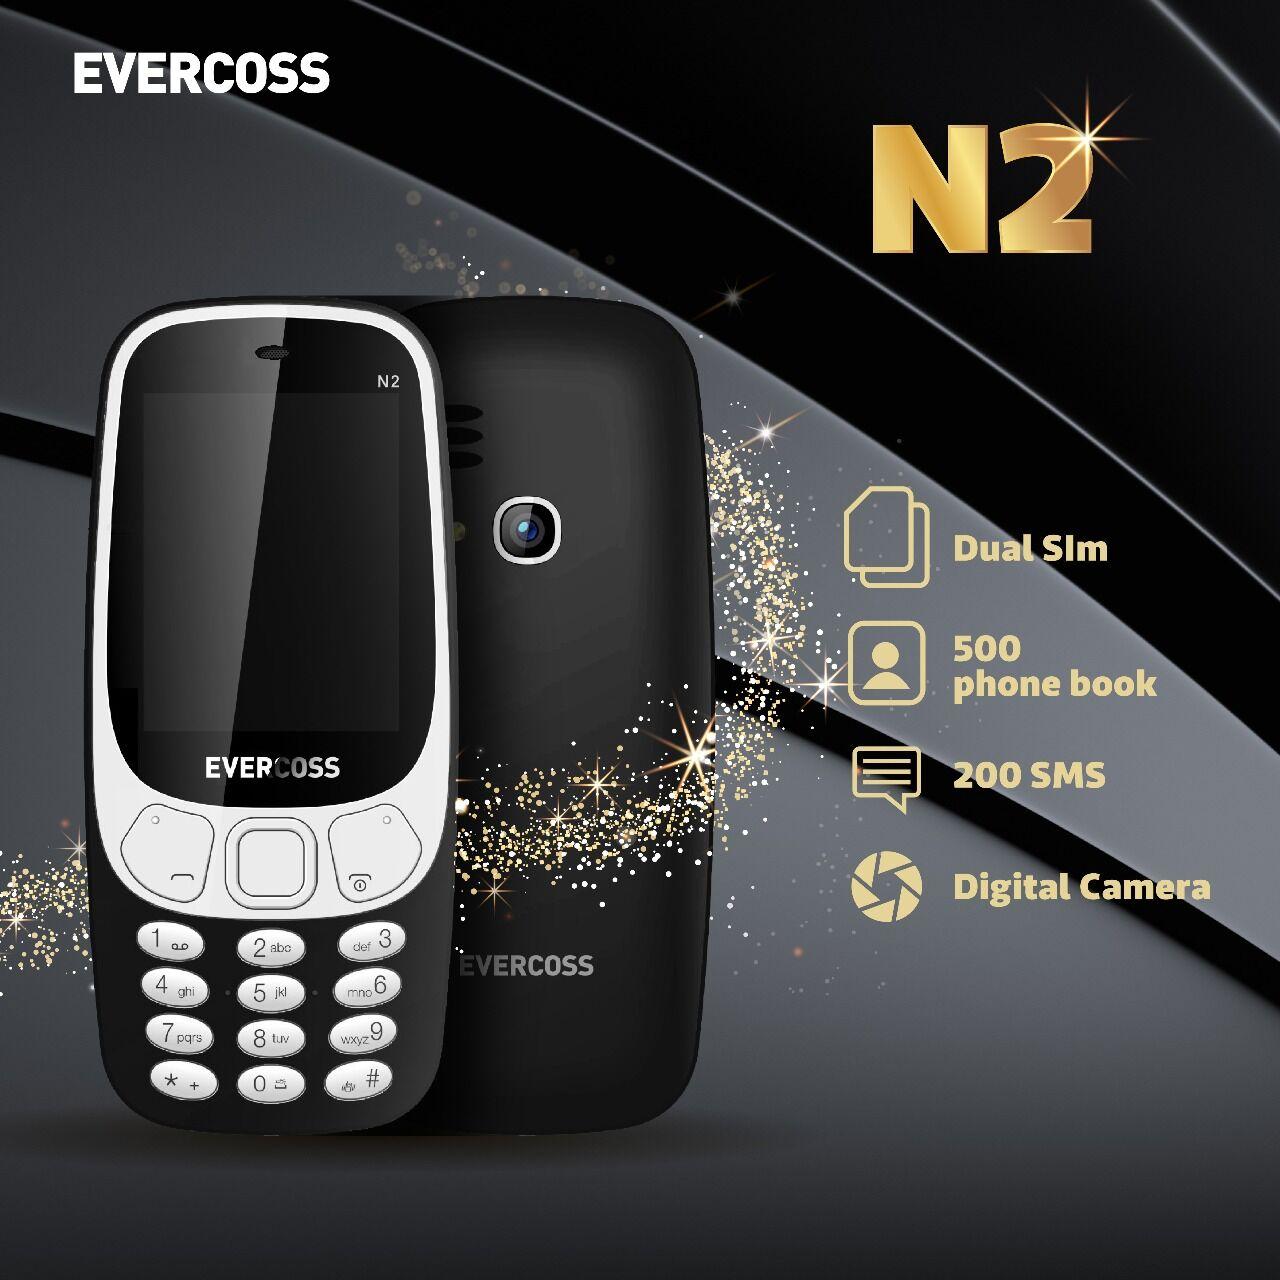 Evercoss New N2 1